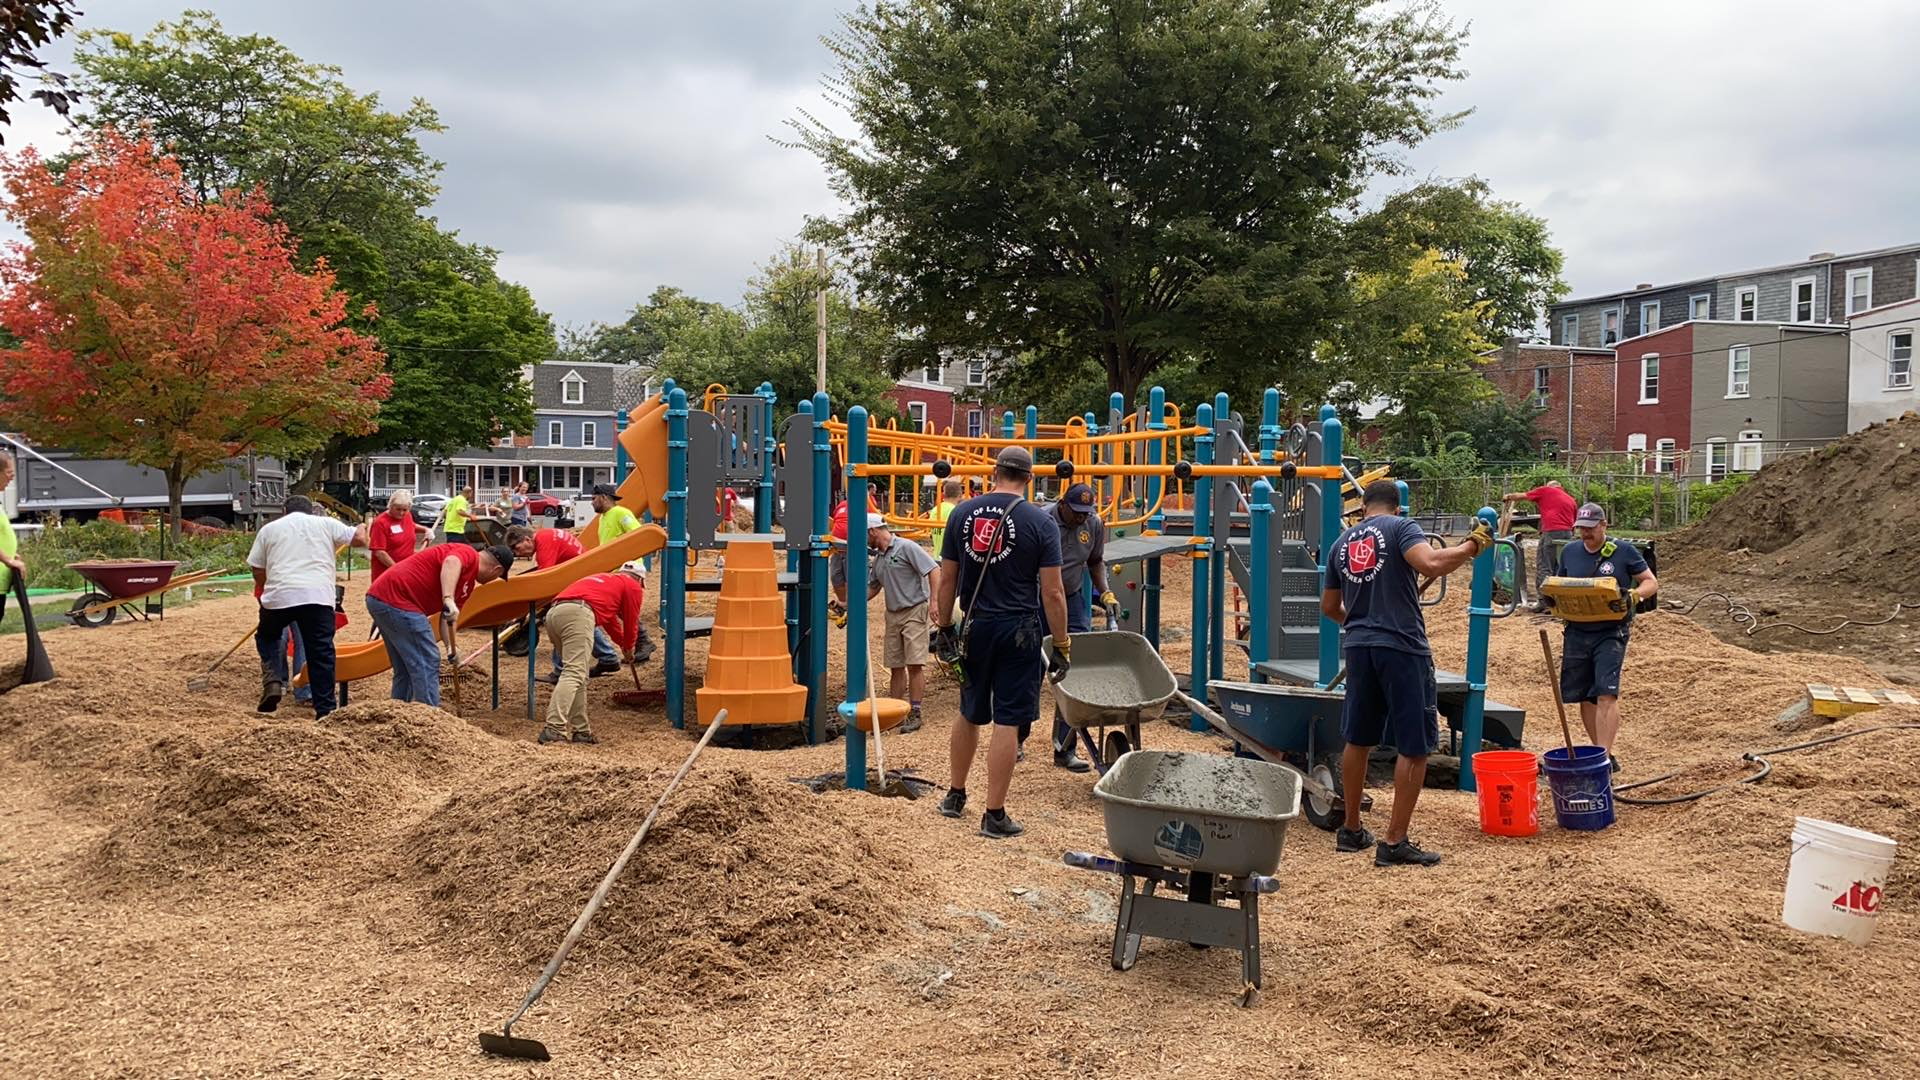 'Kid designed' playground opening in Lancaster's Milburn Park